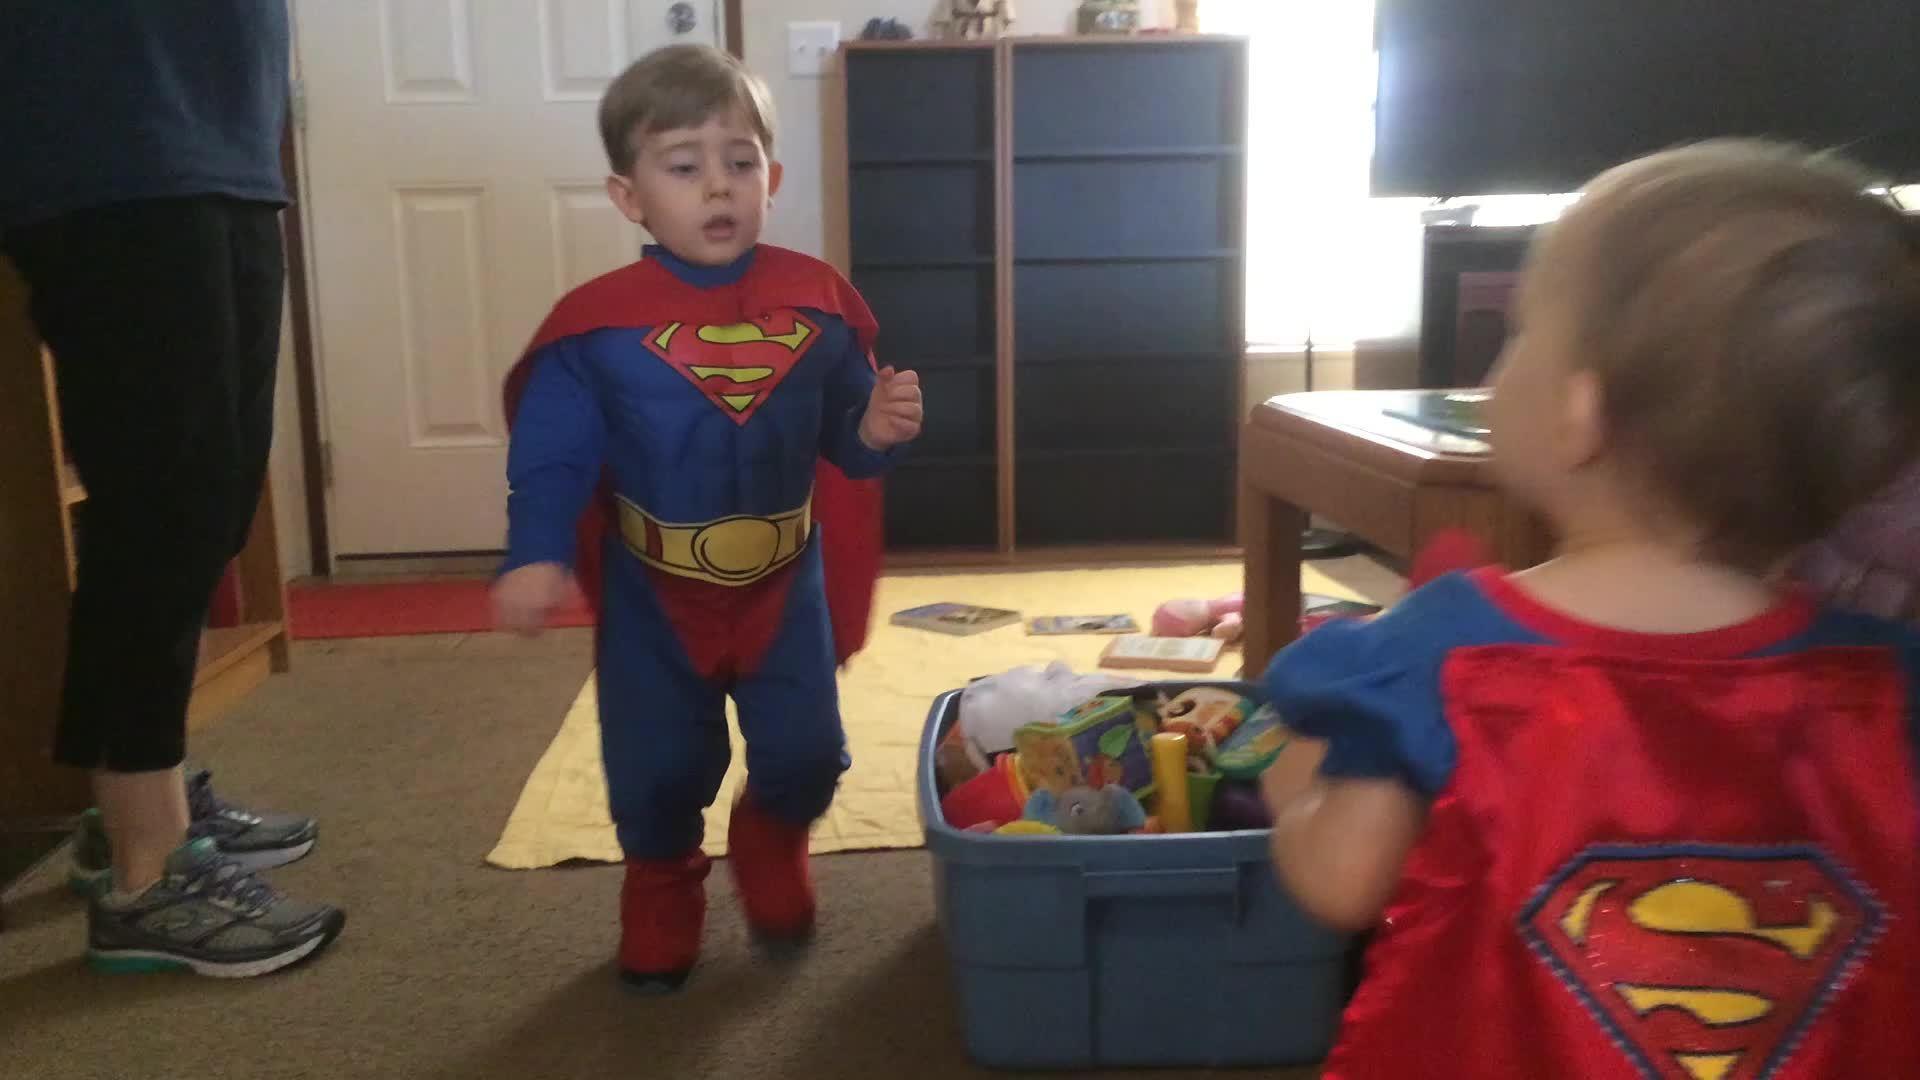 Supergirl, aww, cute, Halloween hug. GIFs